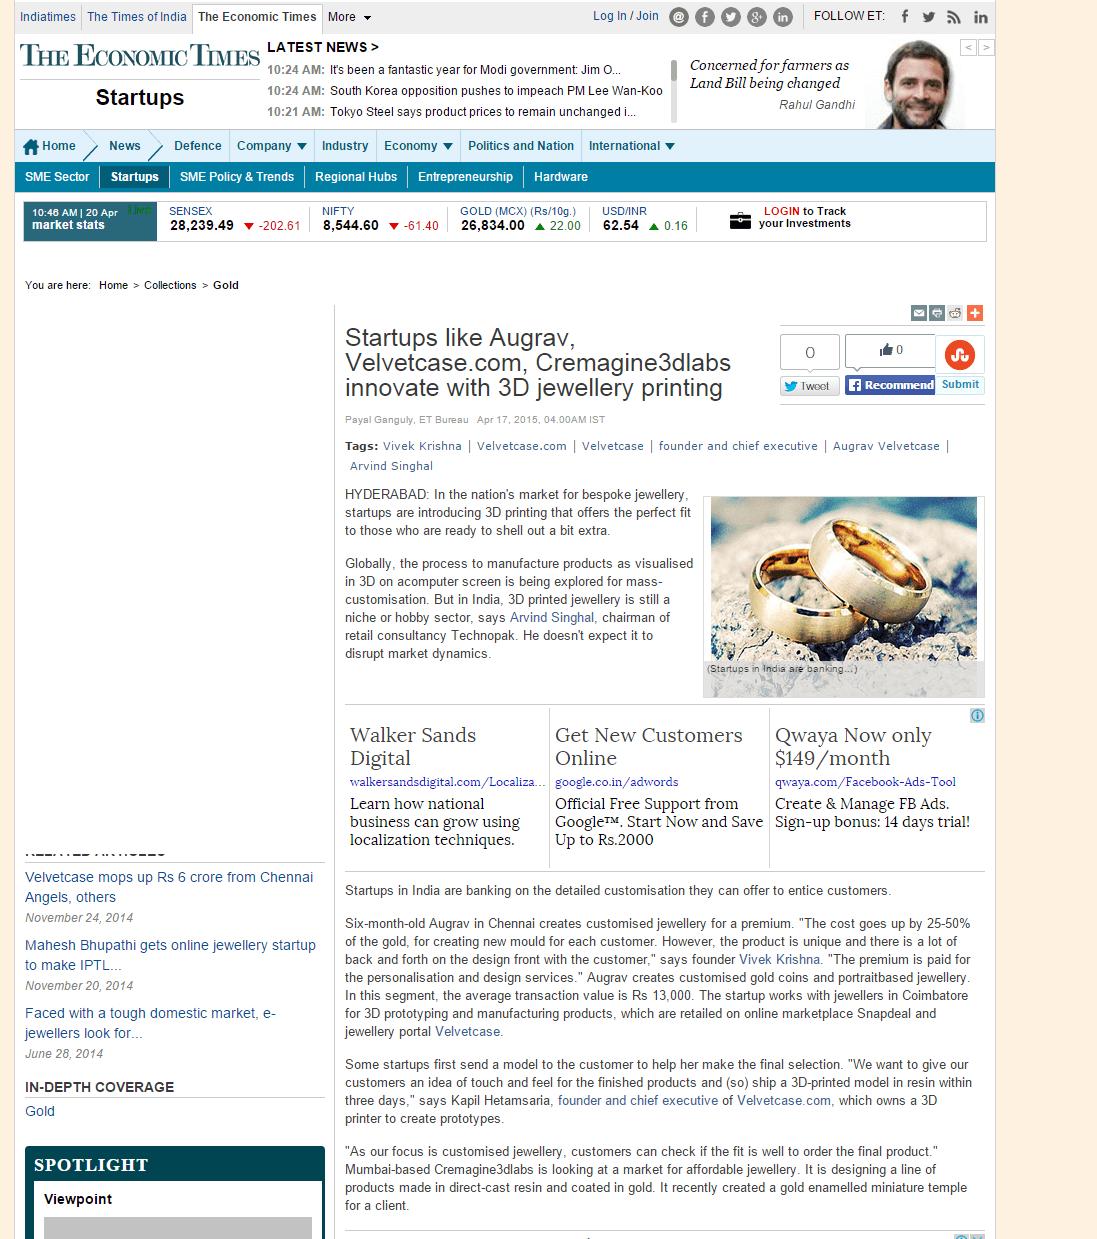 economictimes-customised-jewellery-3d-printing-augrav